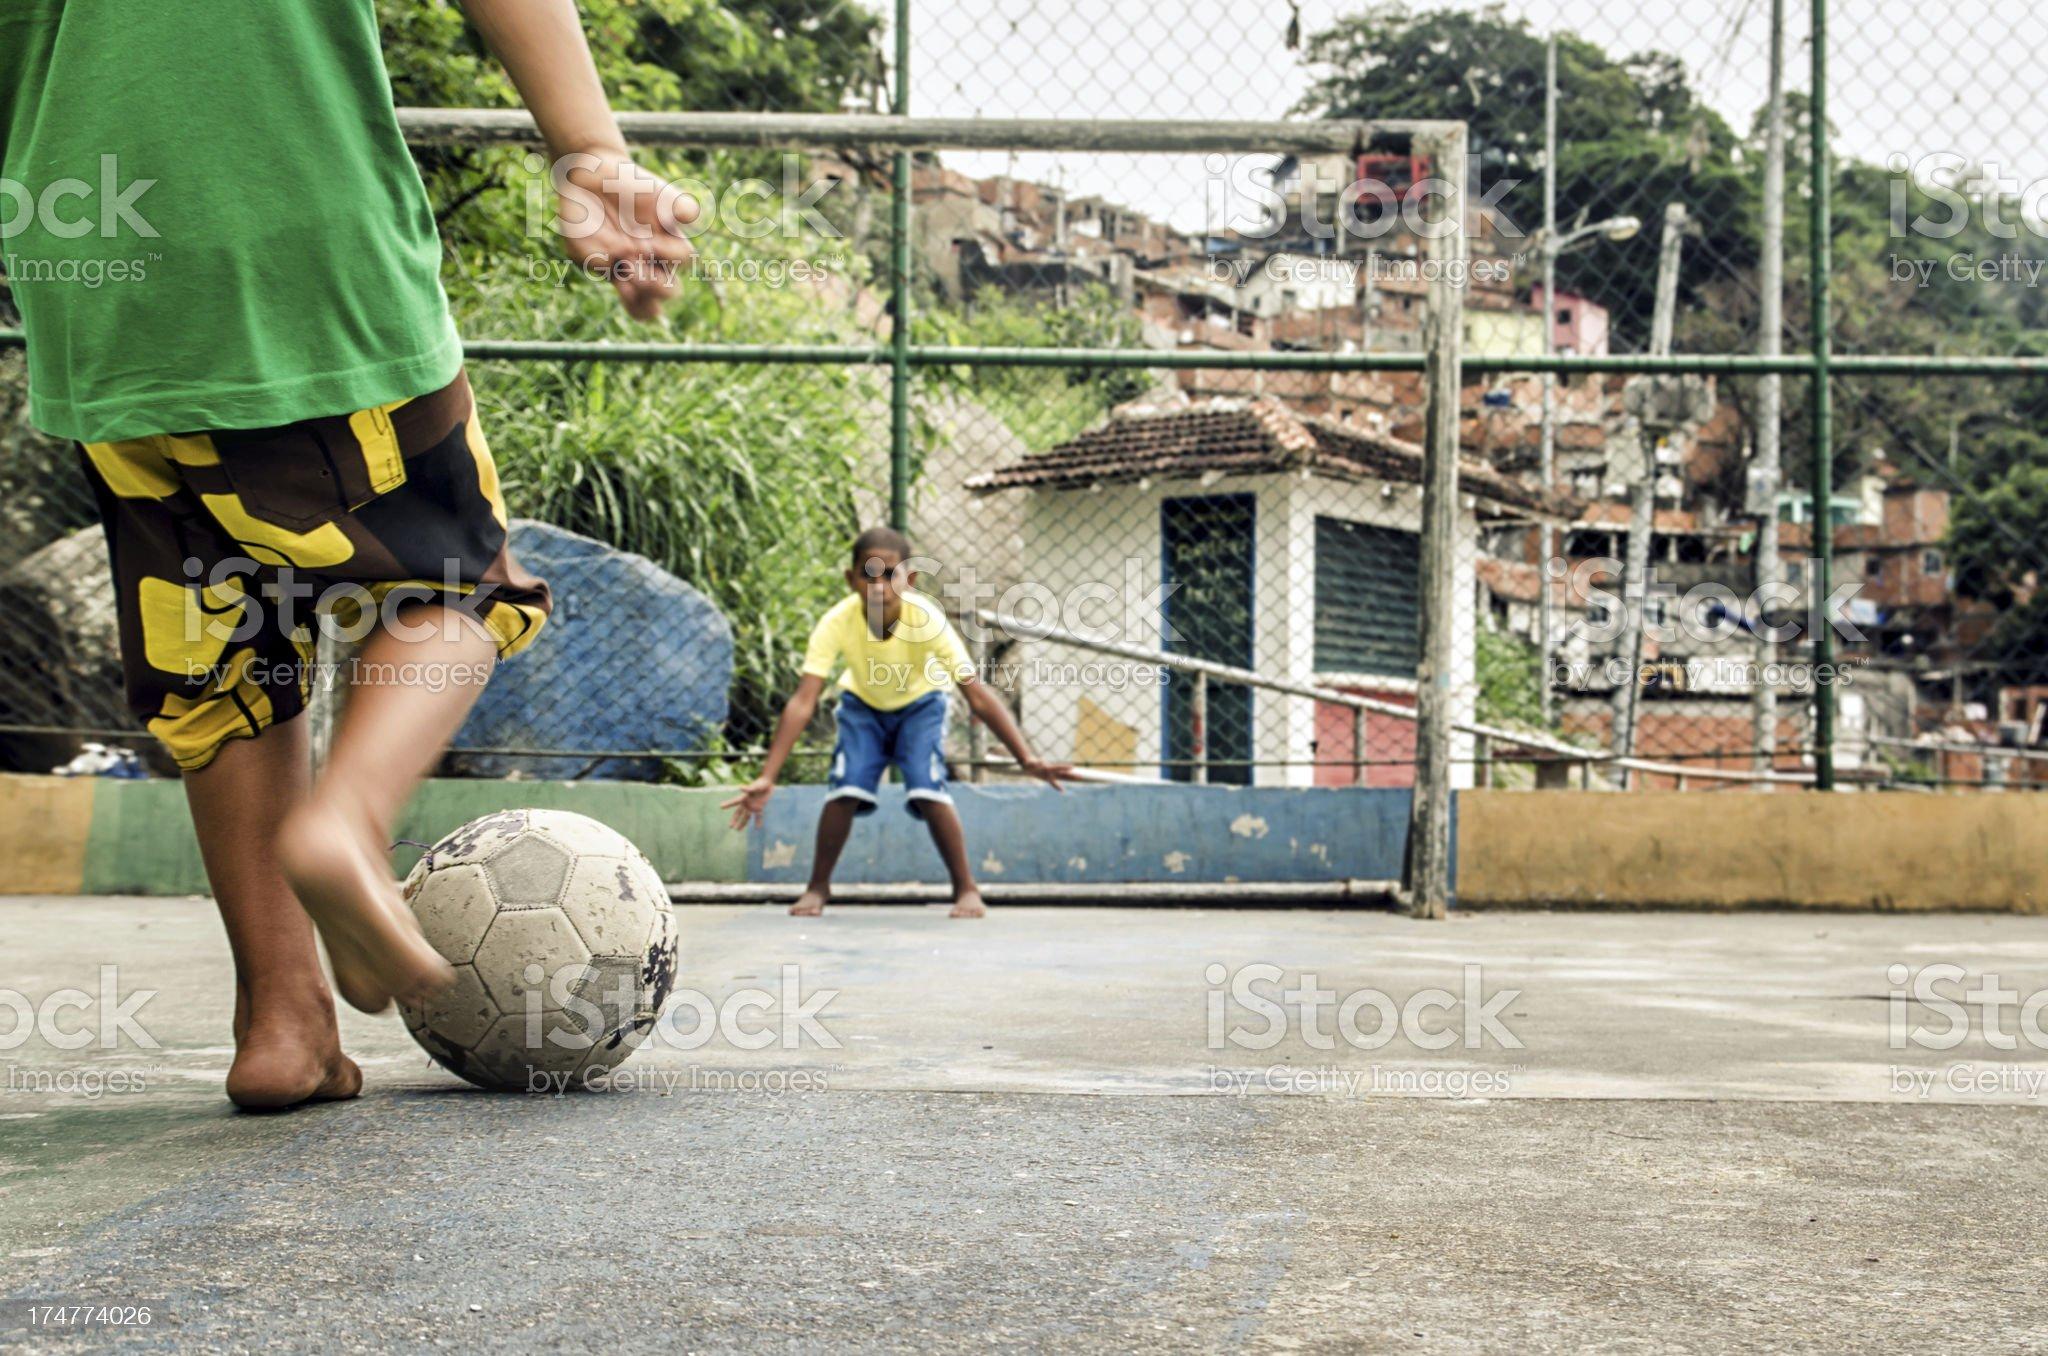 Favela soccer kids royalty-free stock photo